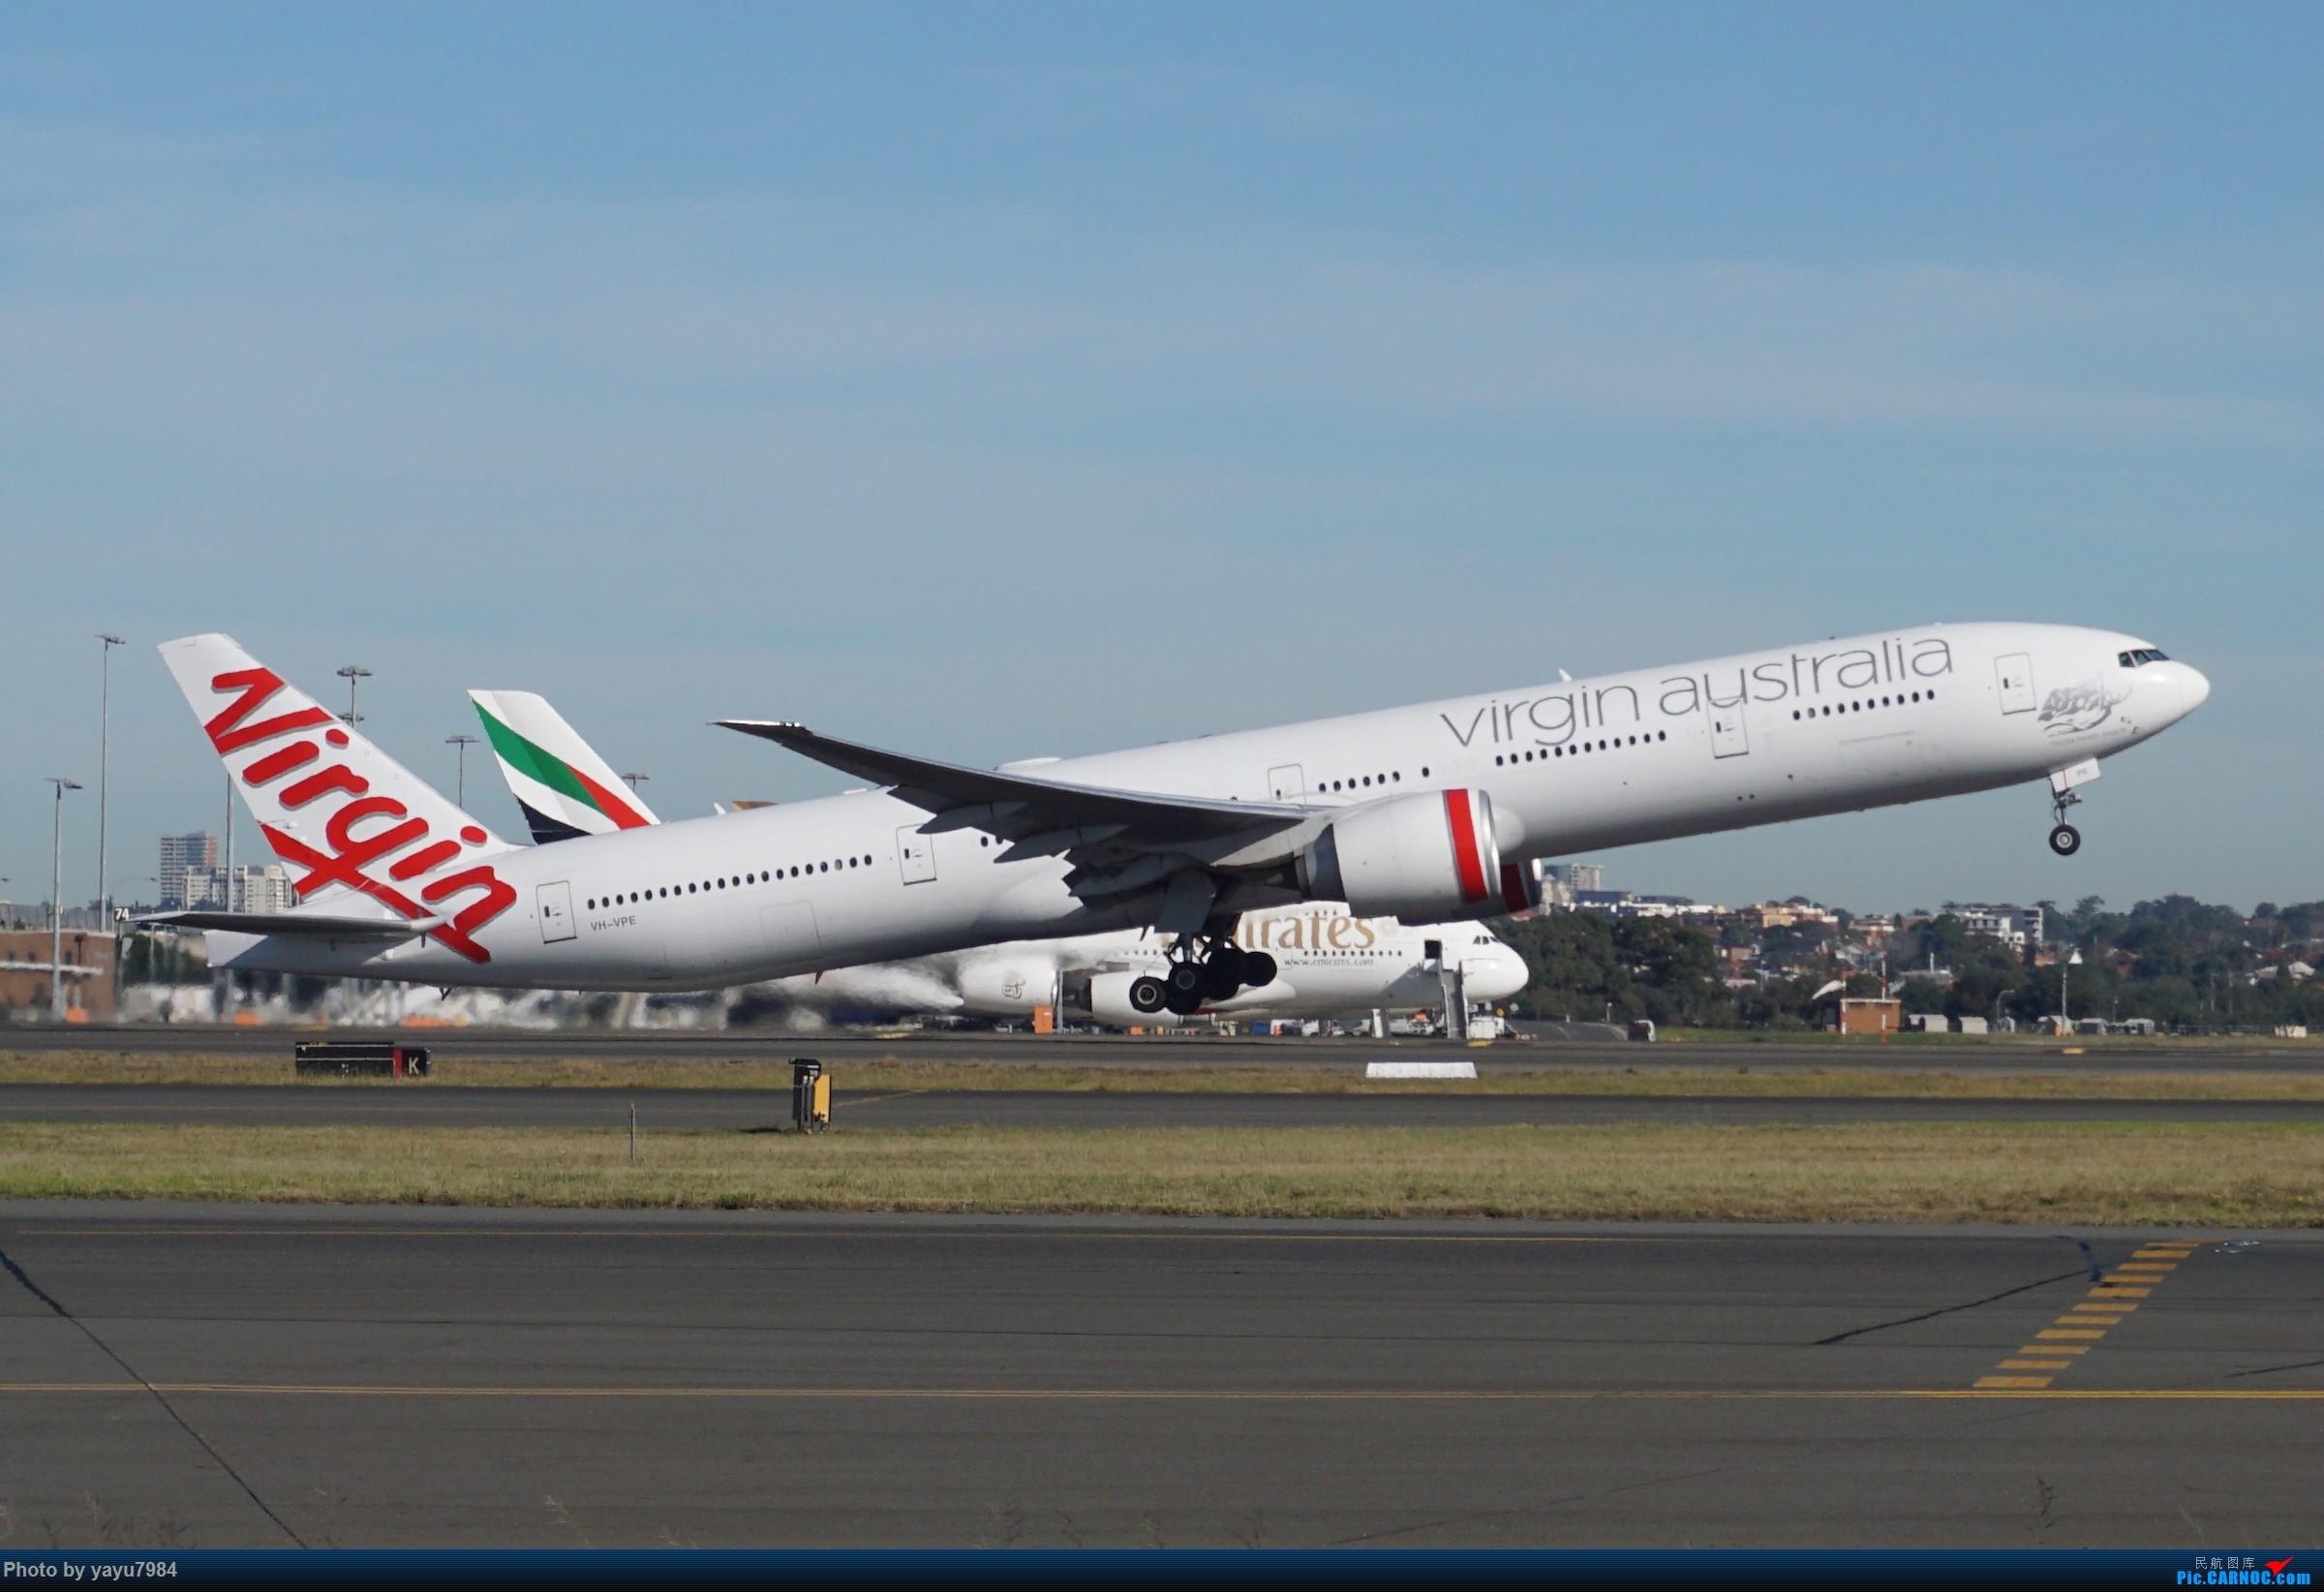 Re:[原创][SYD] 晨悉尼,Blu Emu停车场里拍34L起飞以及滑行 BOEING 777-300ER VH-VPE 澳大利亚悉尼金斯福德·史密斯机场